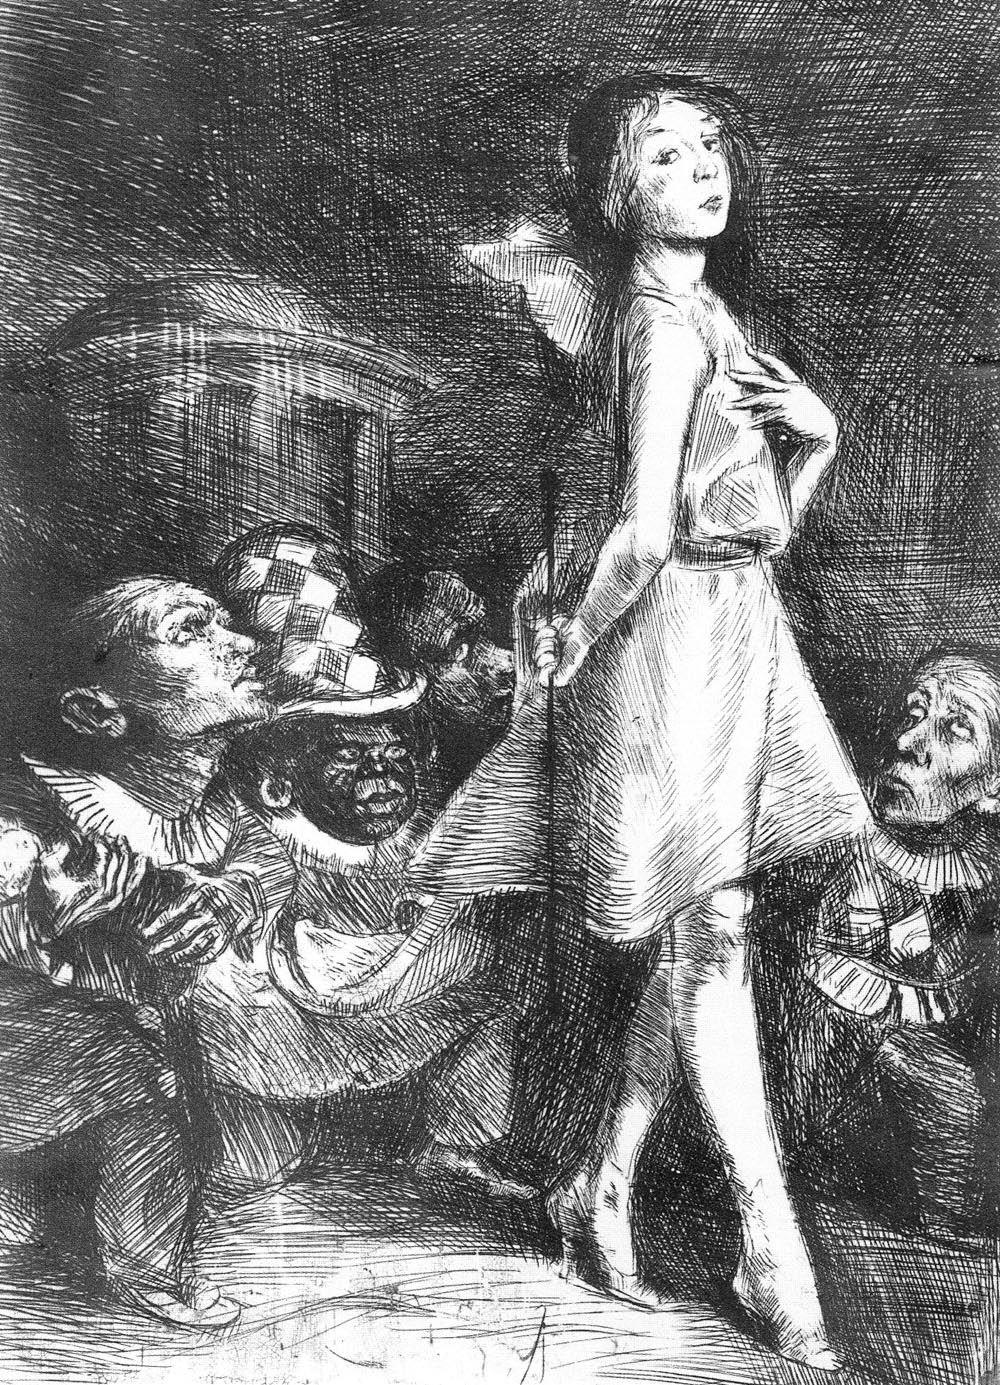 "[""The Infante and her Dwarfs"", Bruno Schulz, 1920-22, cliché-verre, 18 x 13 cm, Museum of Literature, Warsaw.]"